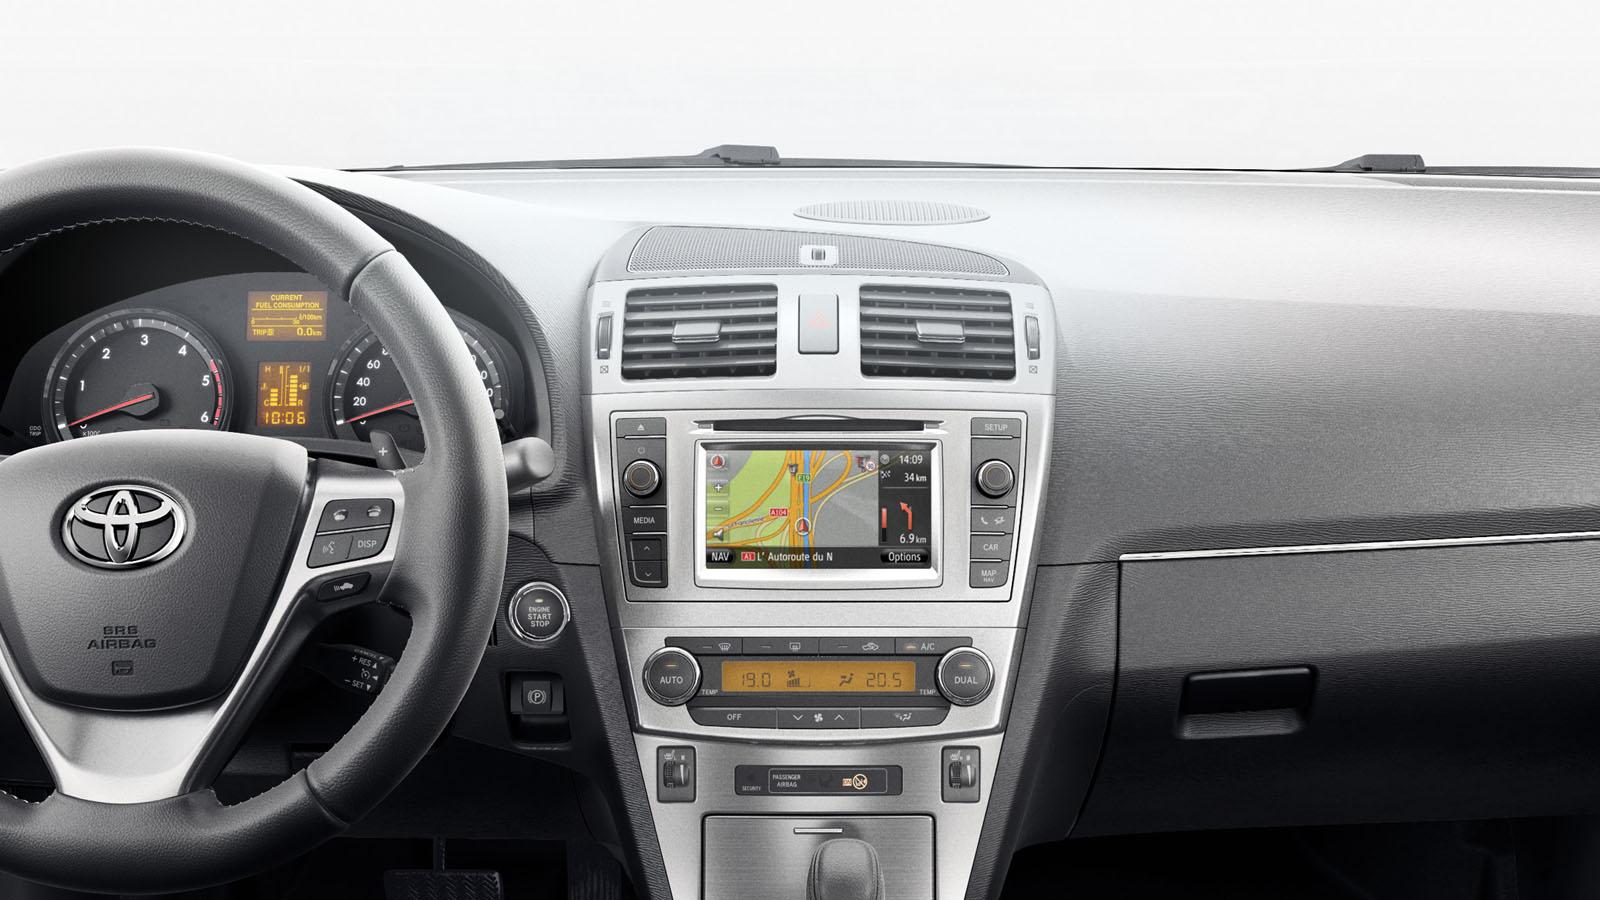 Actualizaciones Mapa Gps Toyota Espana